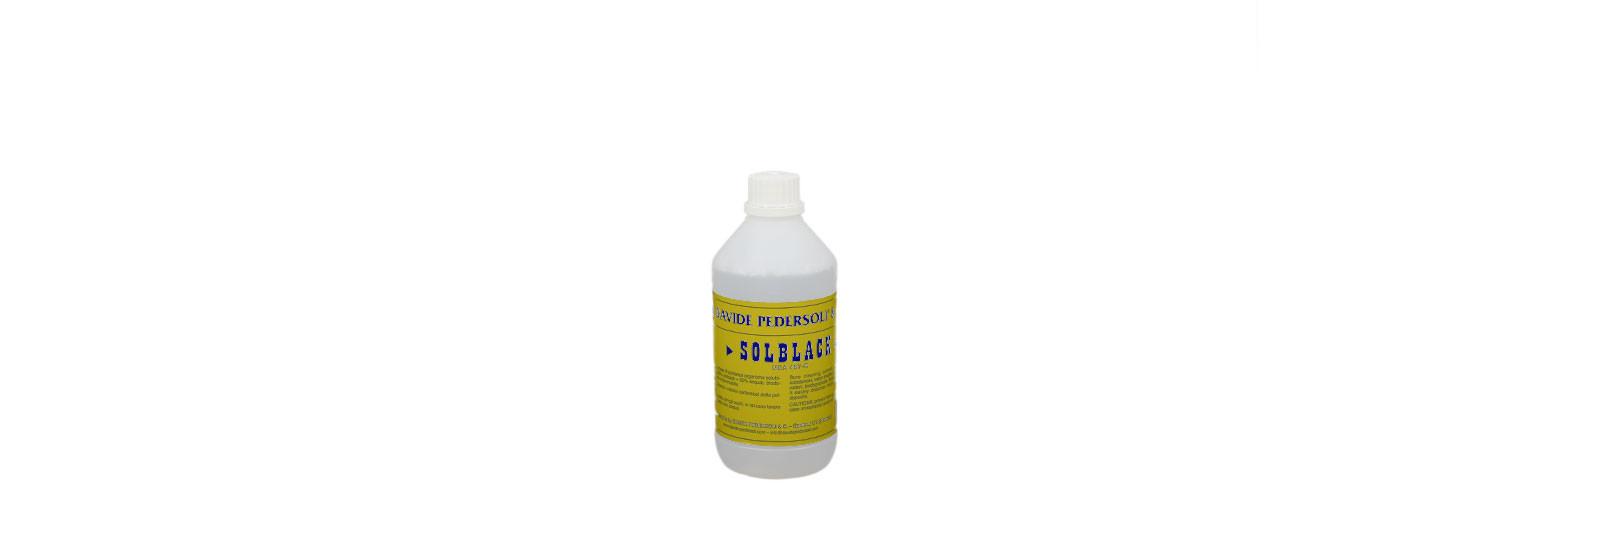 """Solblack"" solvent 500ml"